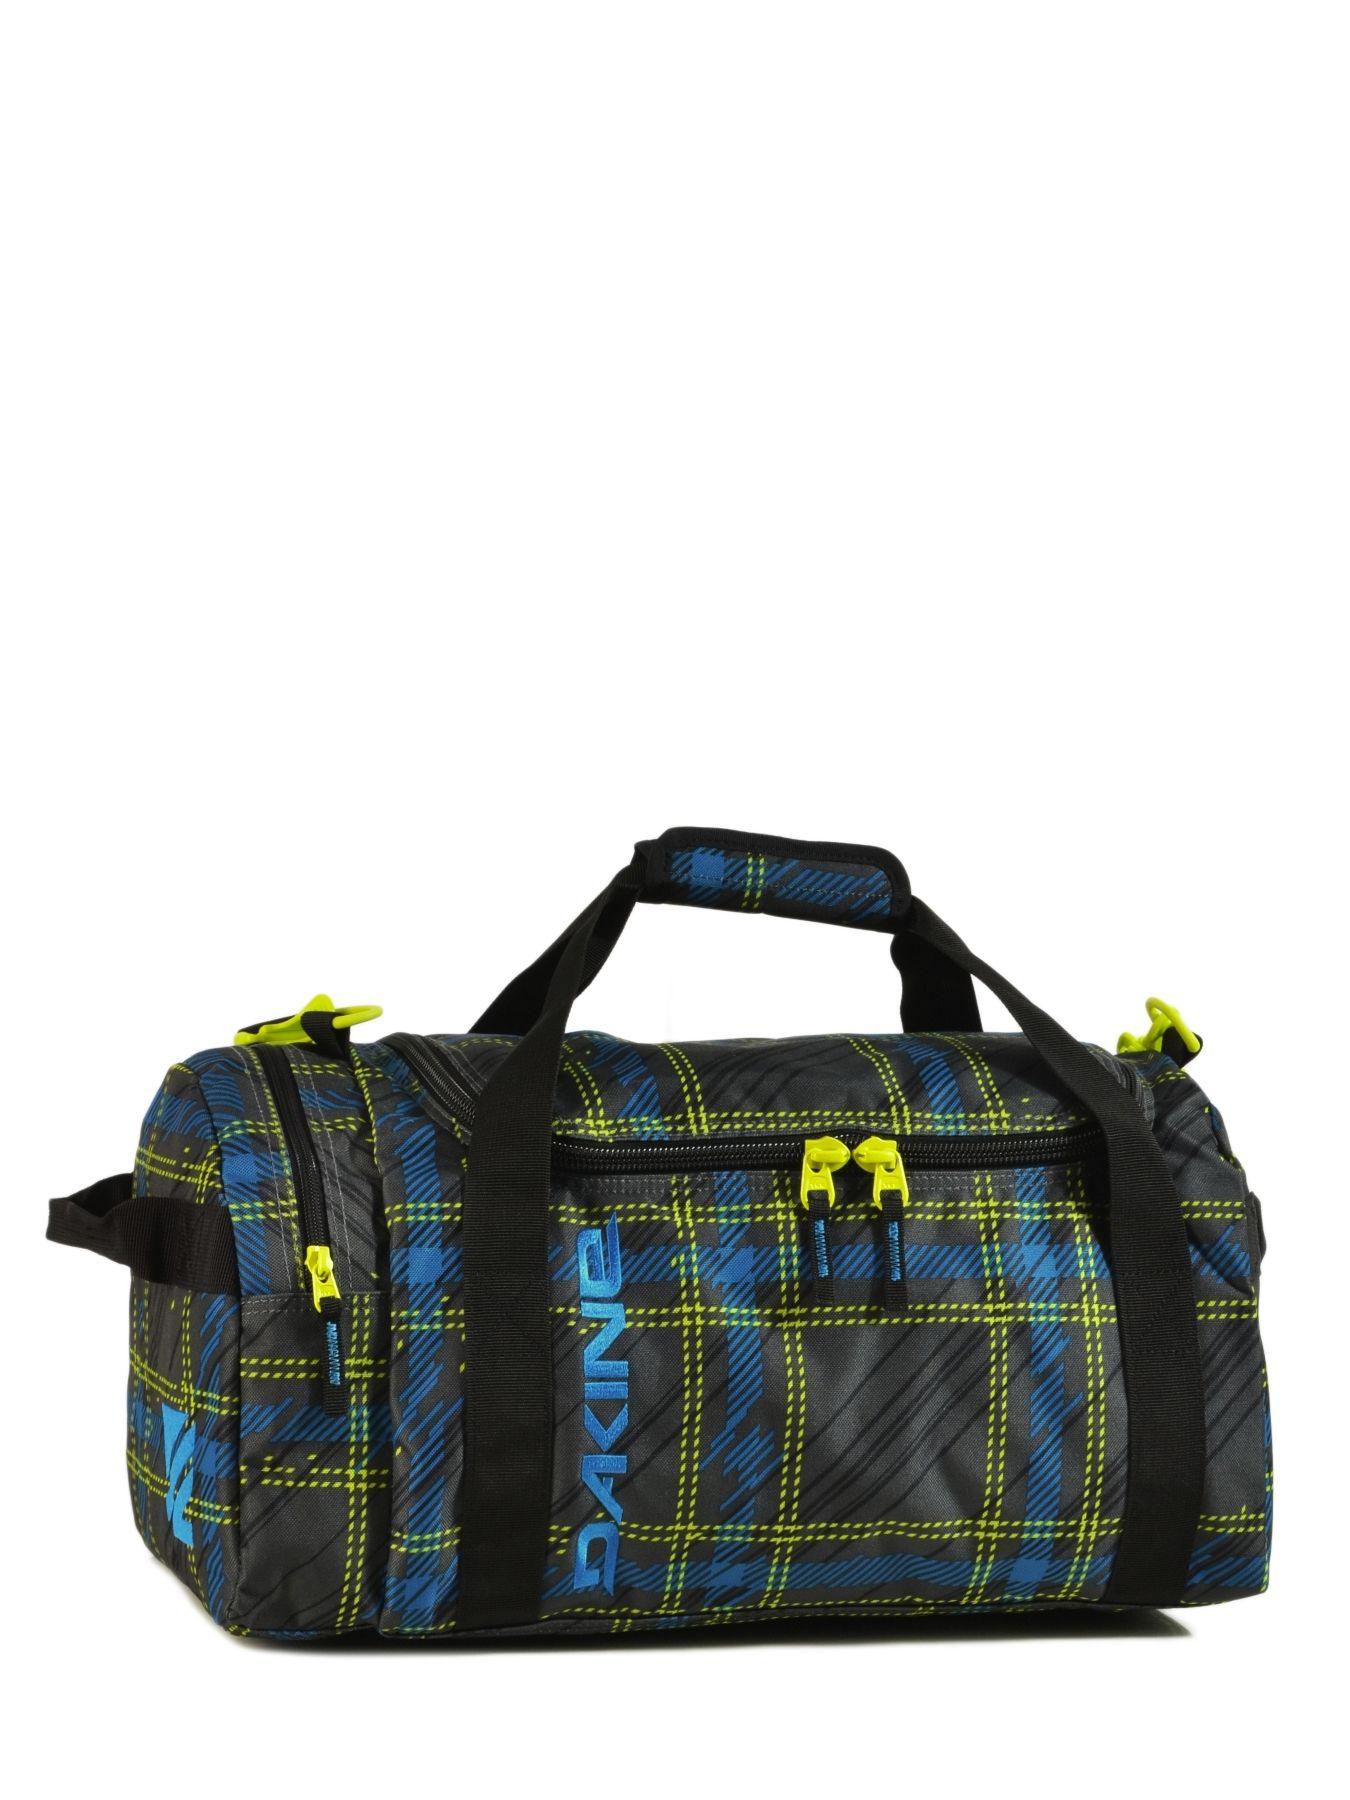 sac de voyage cabine dakine travel bags mazama en vente au meilleur prix. Black Bedroom Furniture Sets. Home Design Ideas